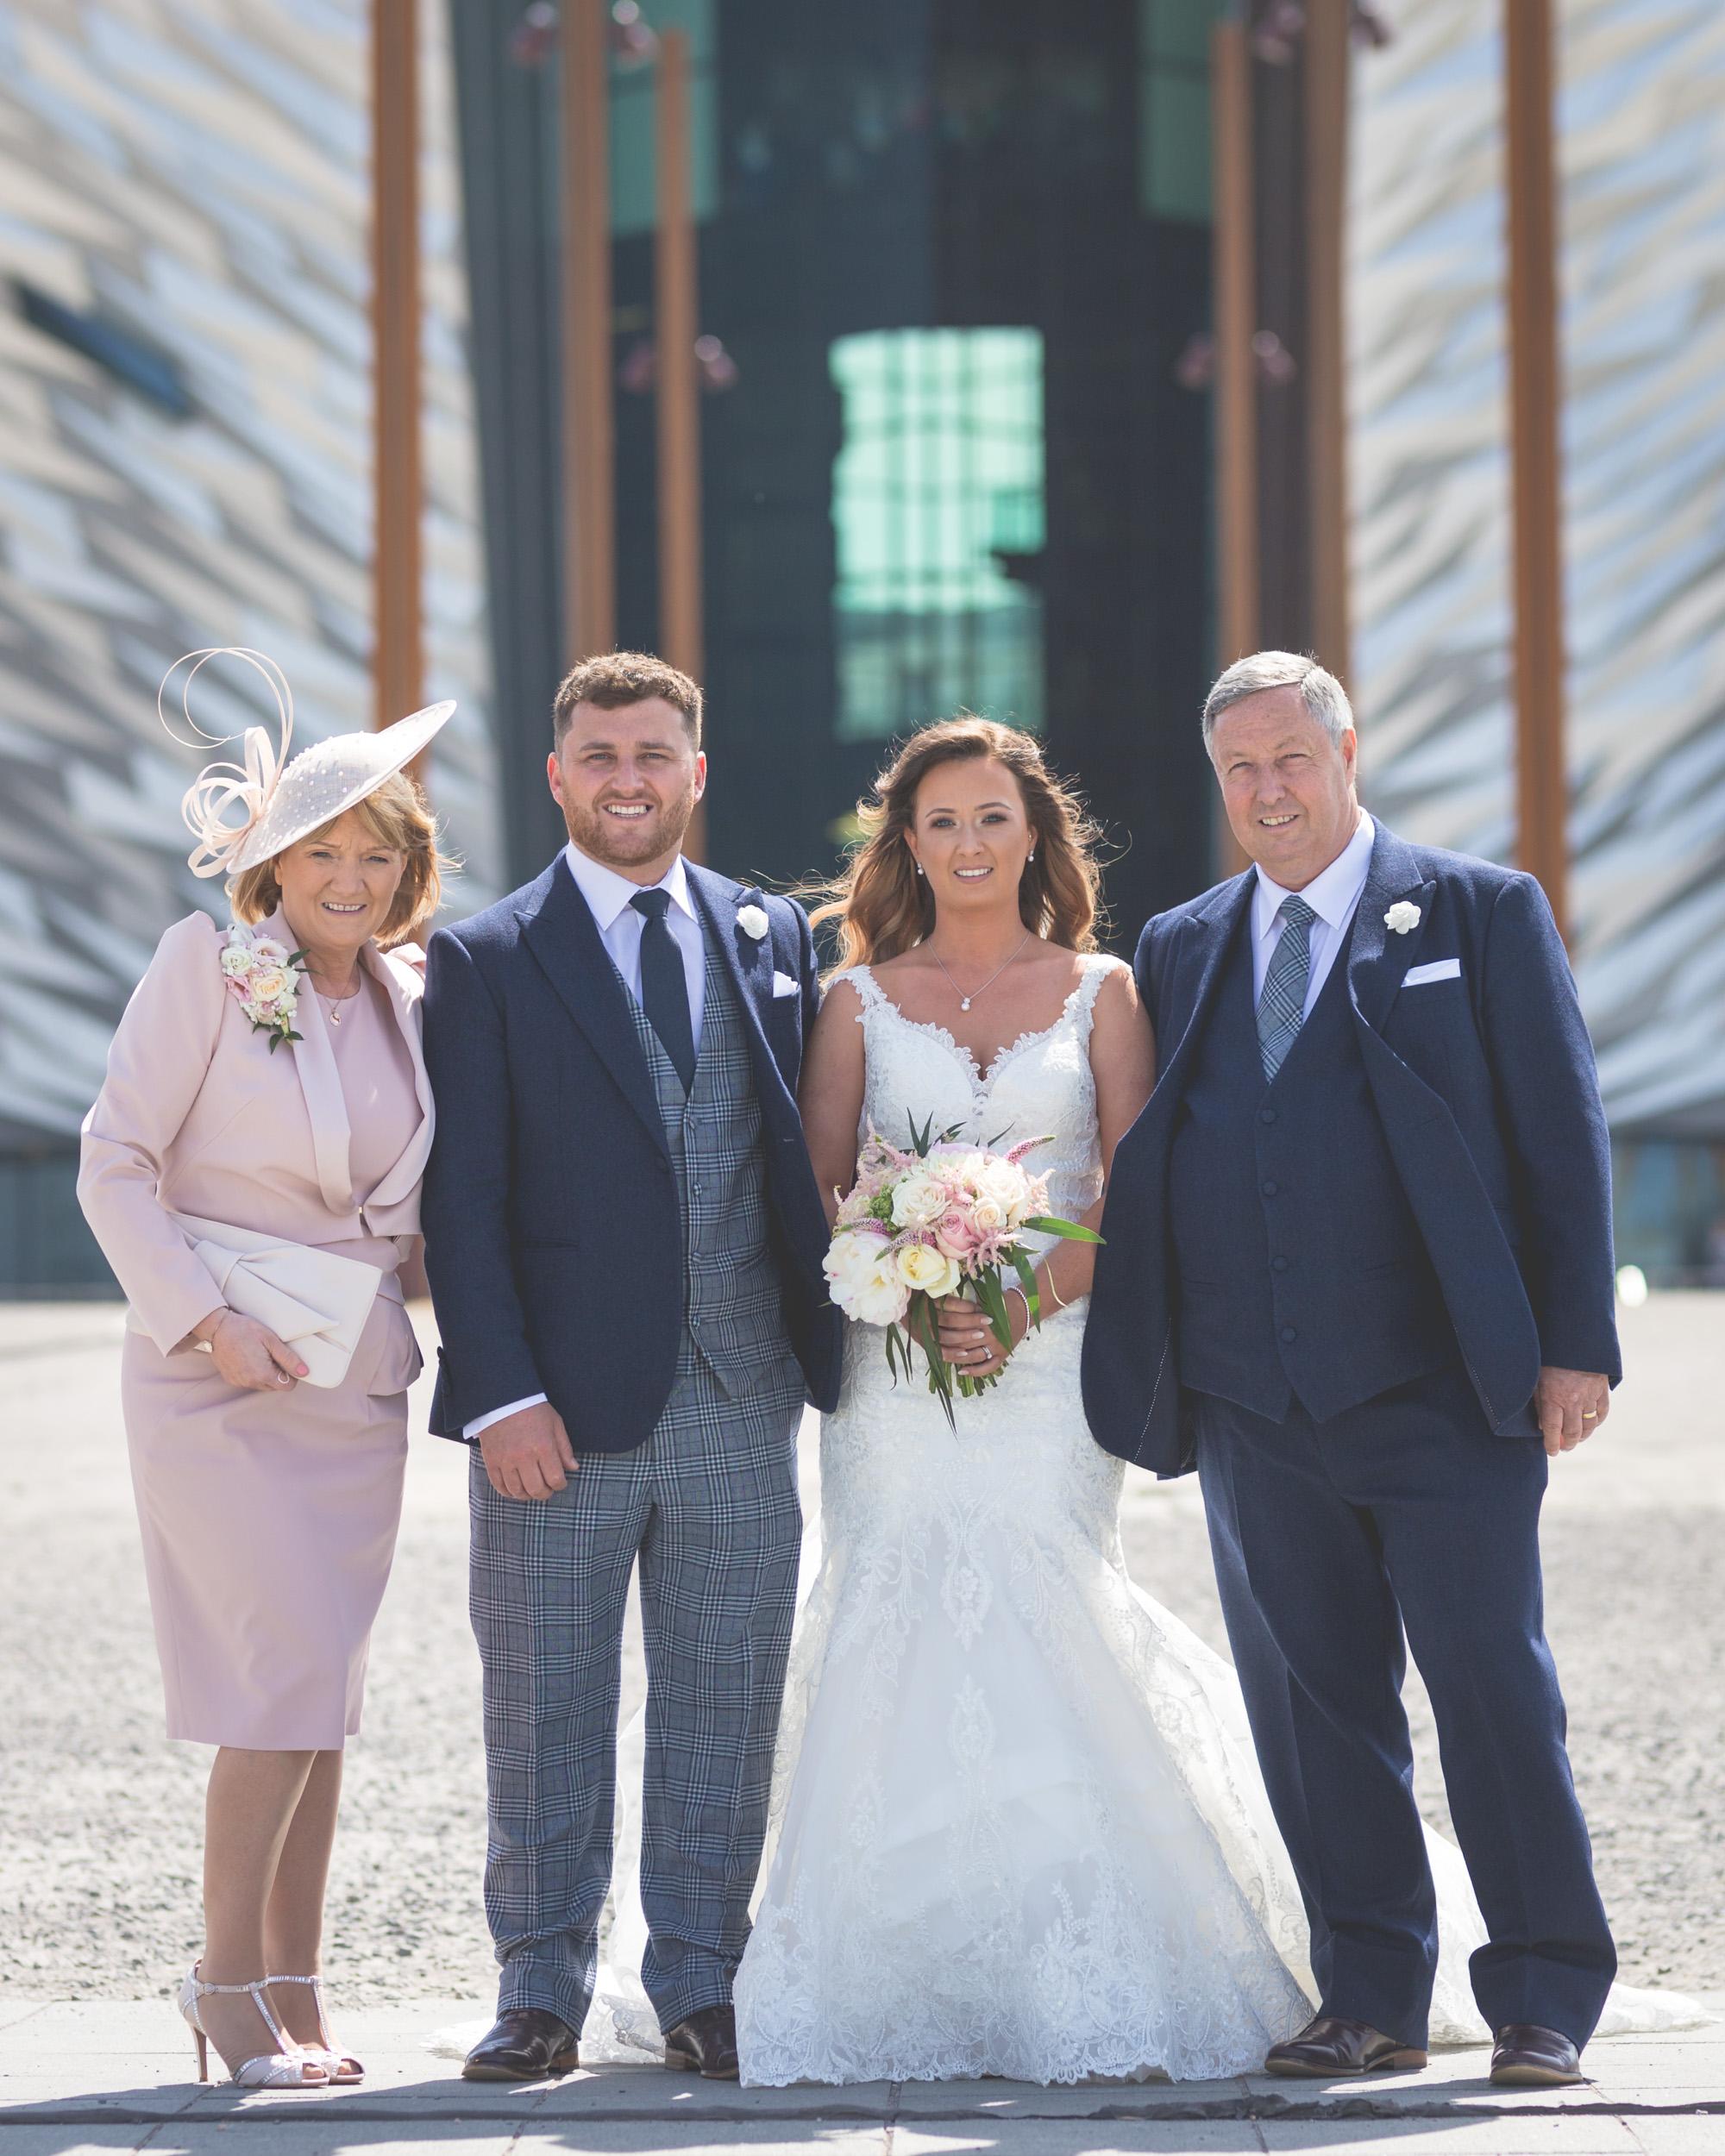 Brian McEwan   Northern Ireland Wedding Photographer   Rebecca & Michael   Portraits-31.jpg